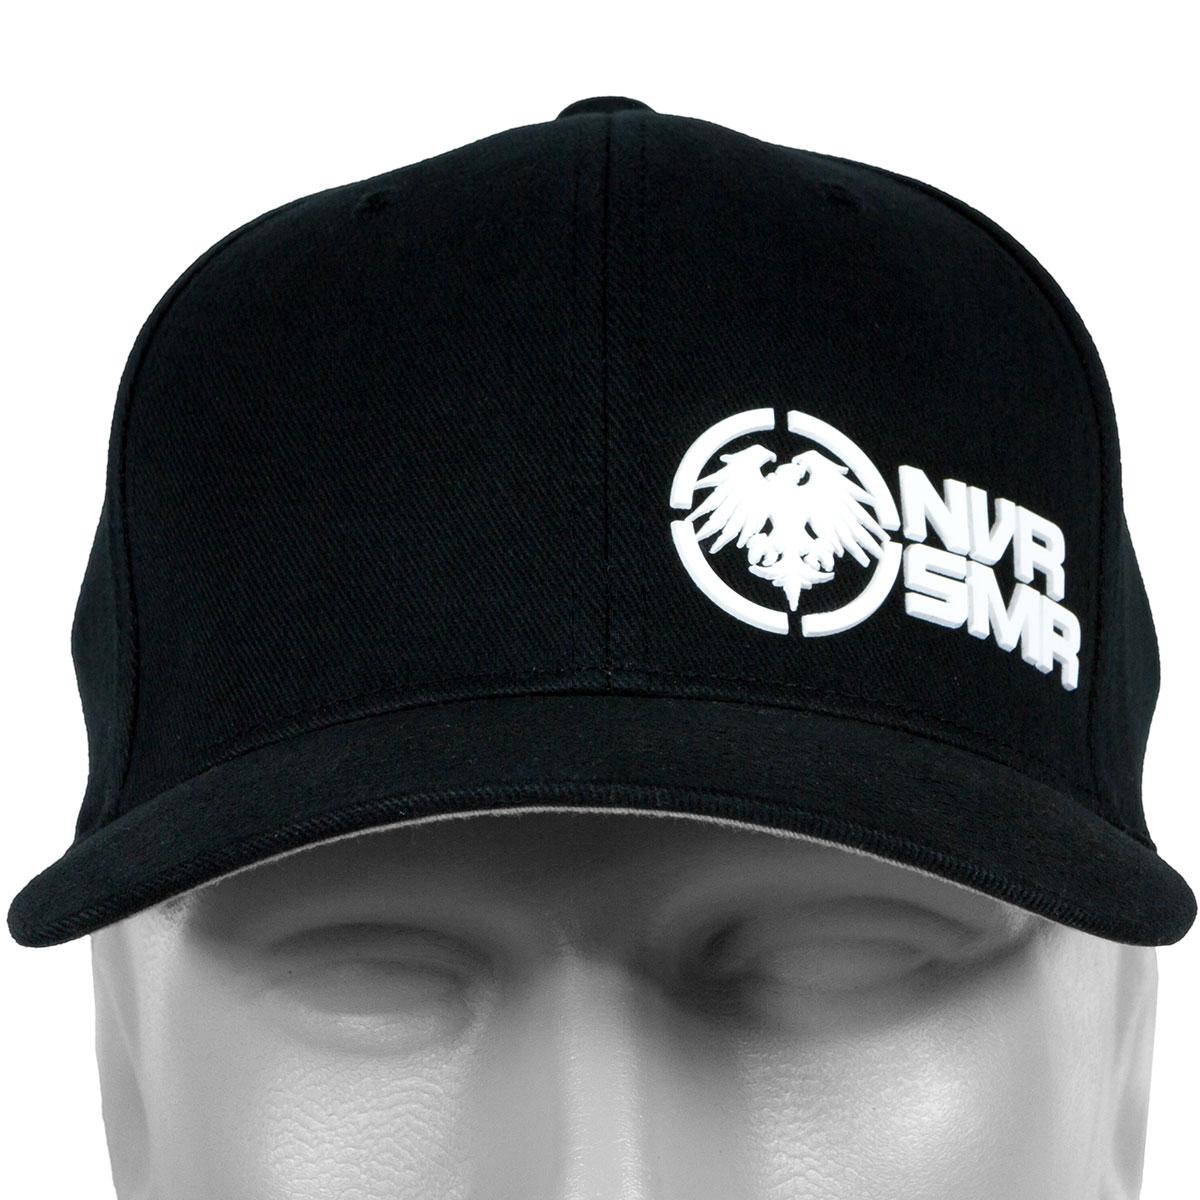 Corporate Sonic Weld Cap